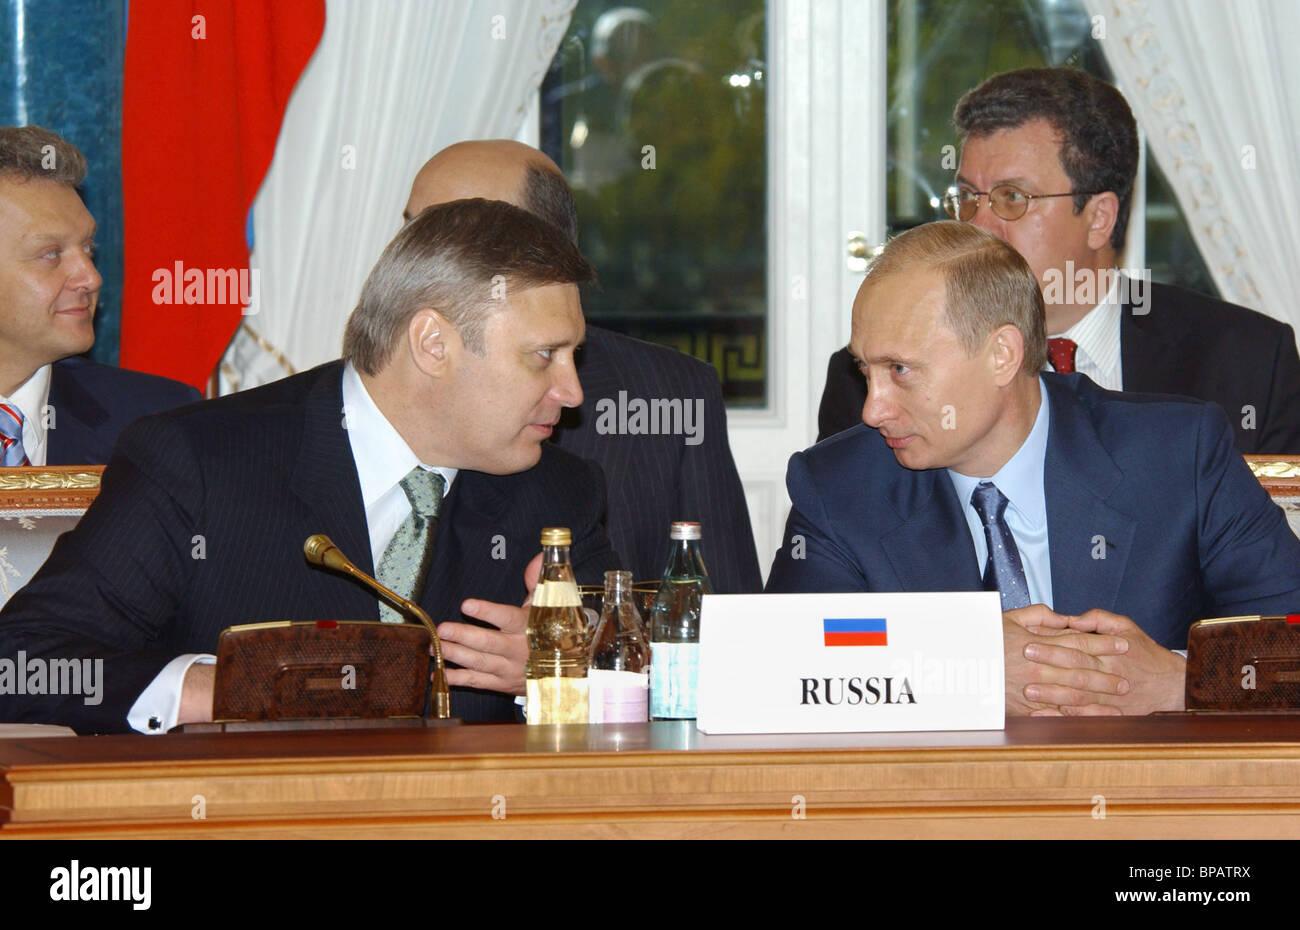 At Russia-EU summit in Strelnya - Stock Image